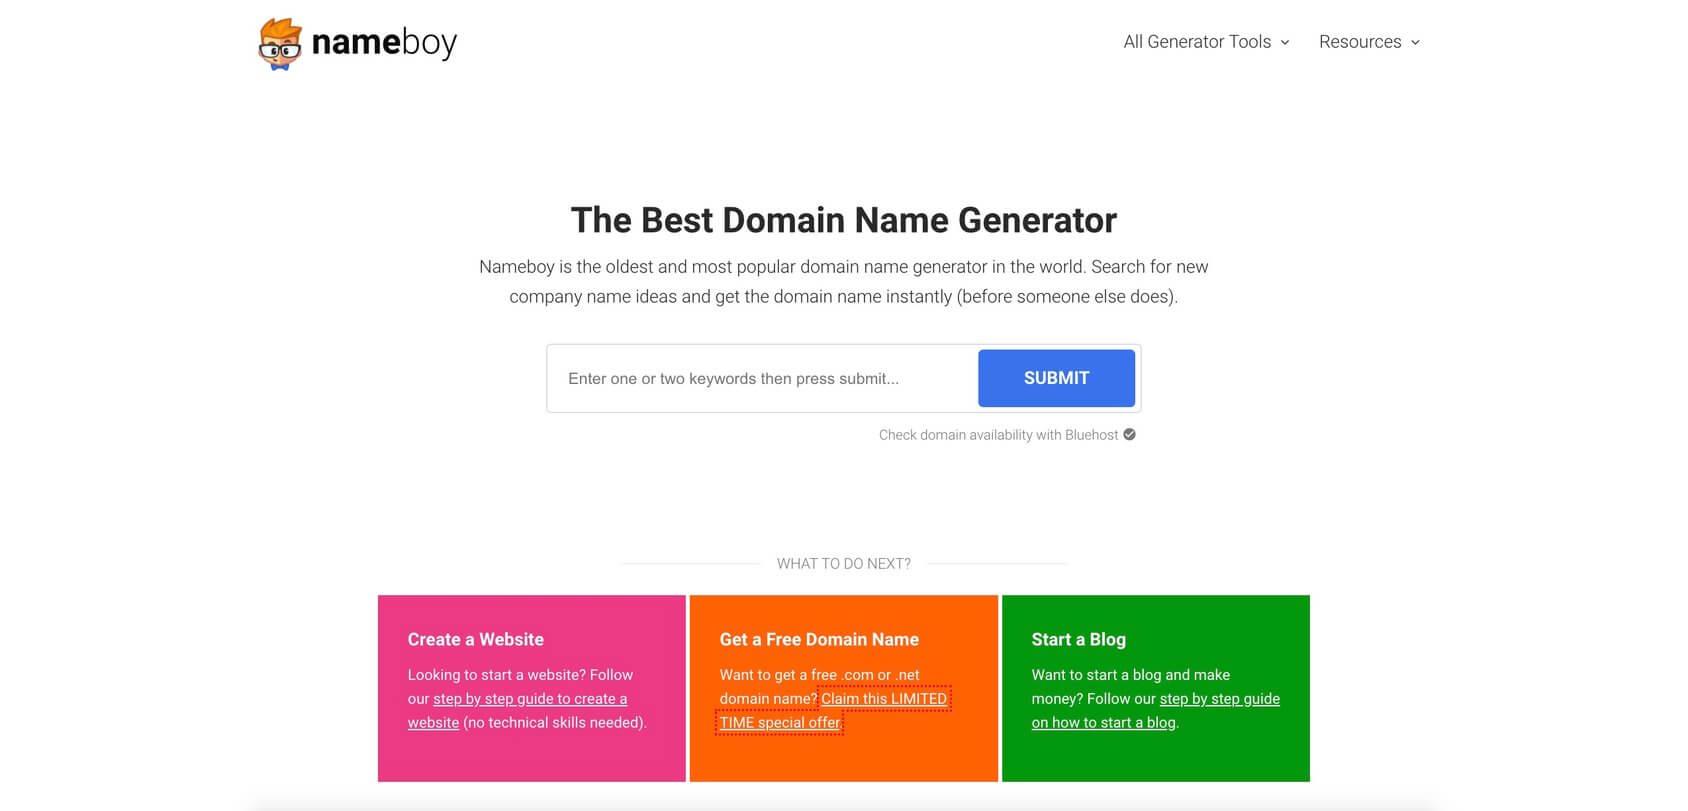 Nameboy homepage